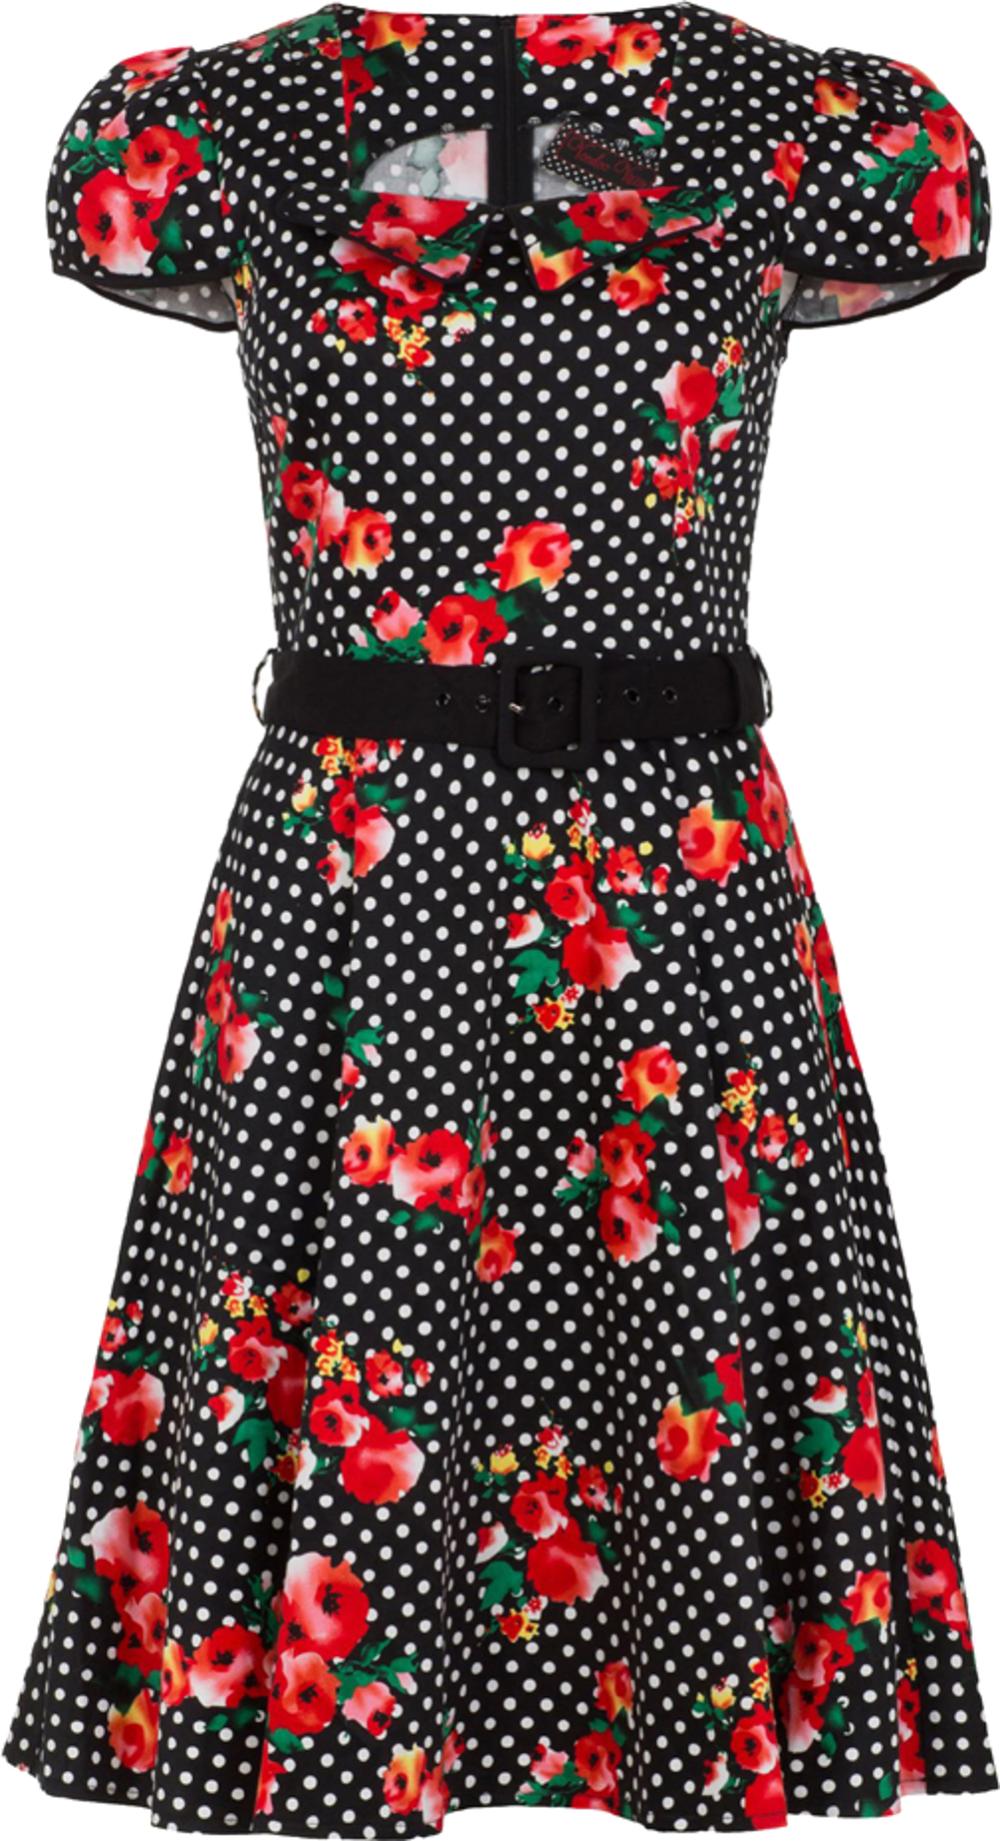 Küstenluder DIXIE Vintage Floral ROSEN Bow Bluse SHIRT Rockabilly